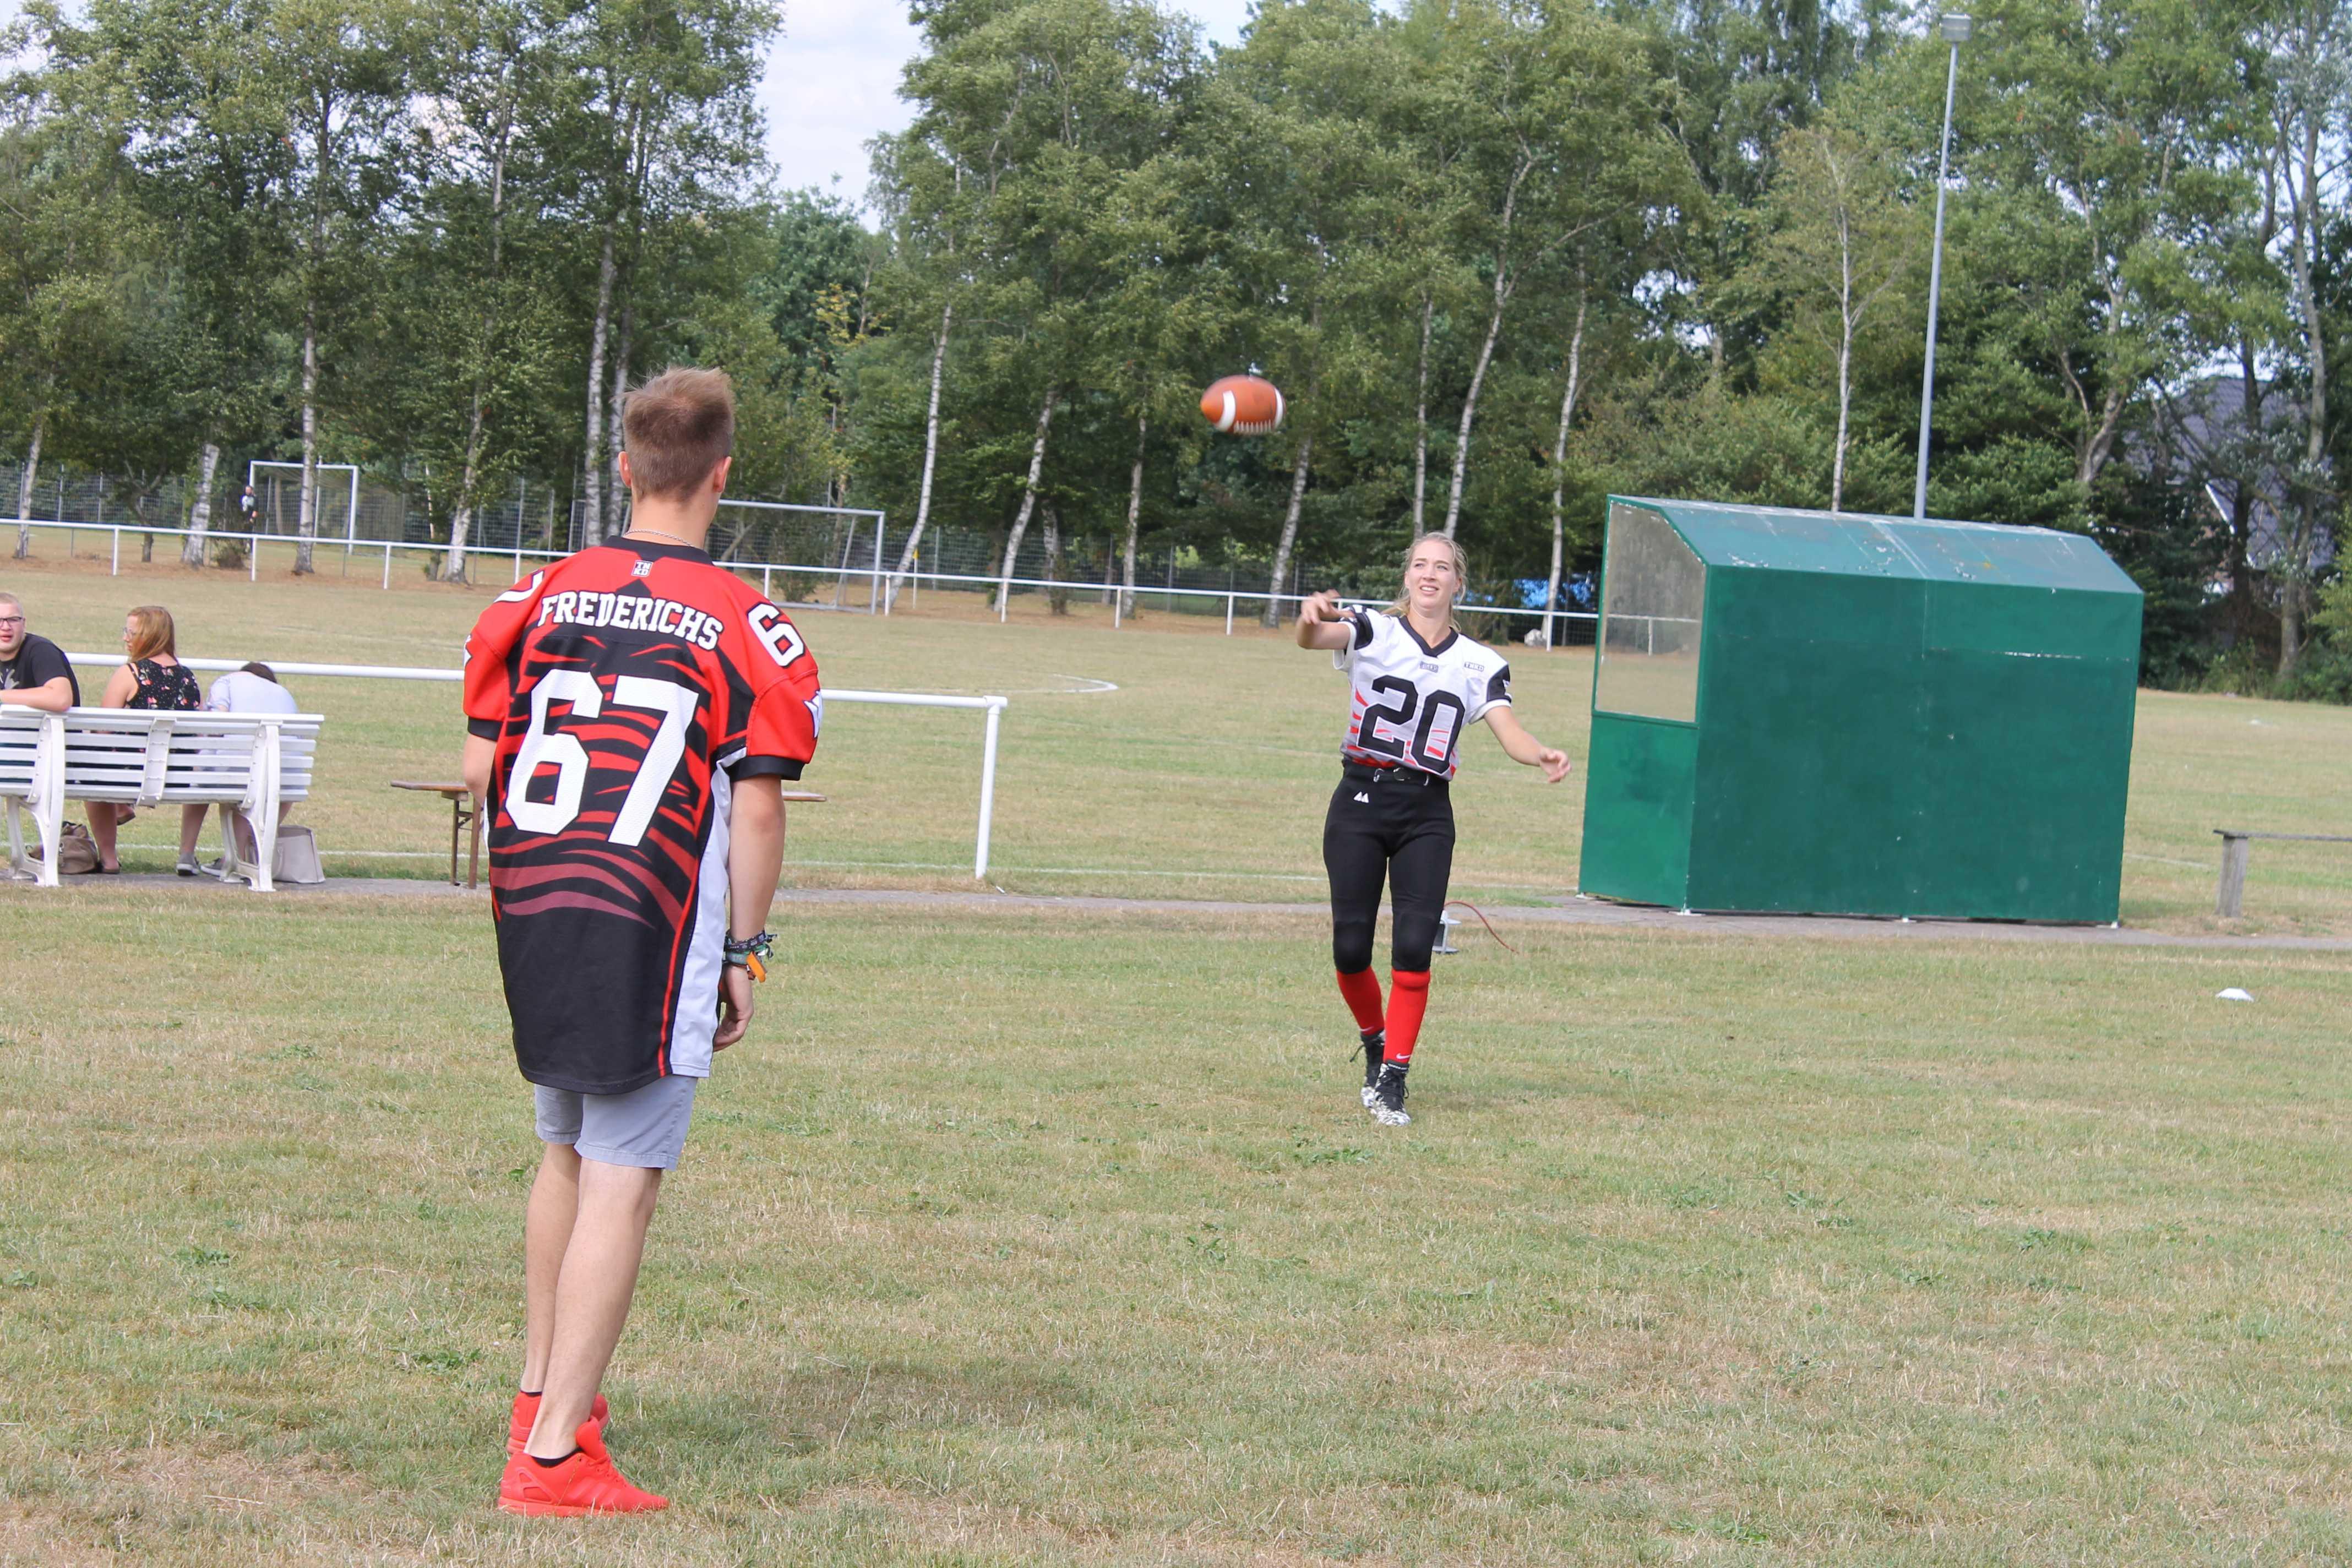 2018-07-29 Sportwoche - Sportpicknick & Football & Fußball (51)